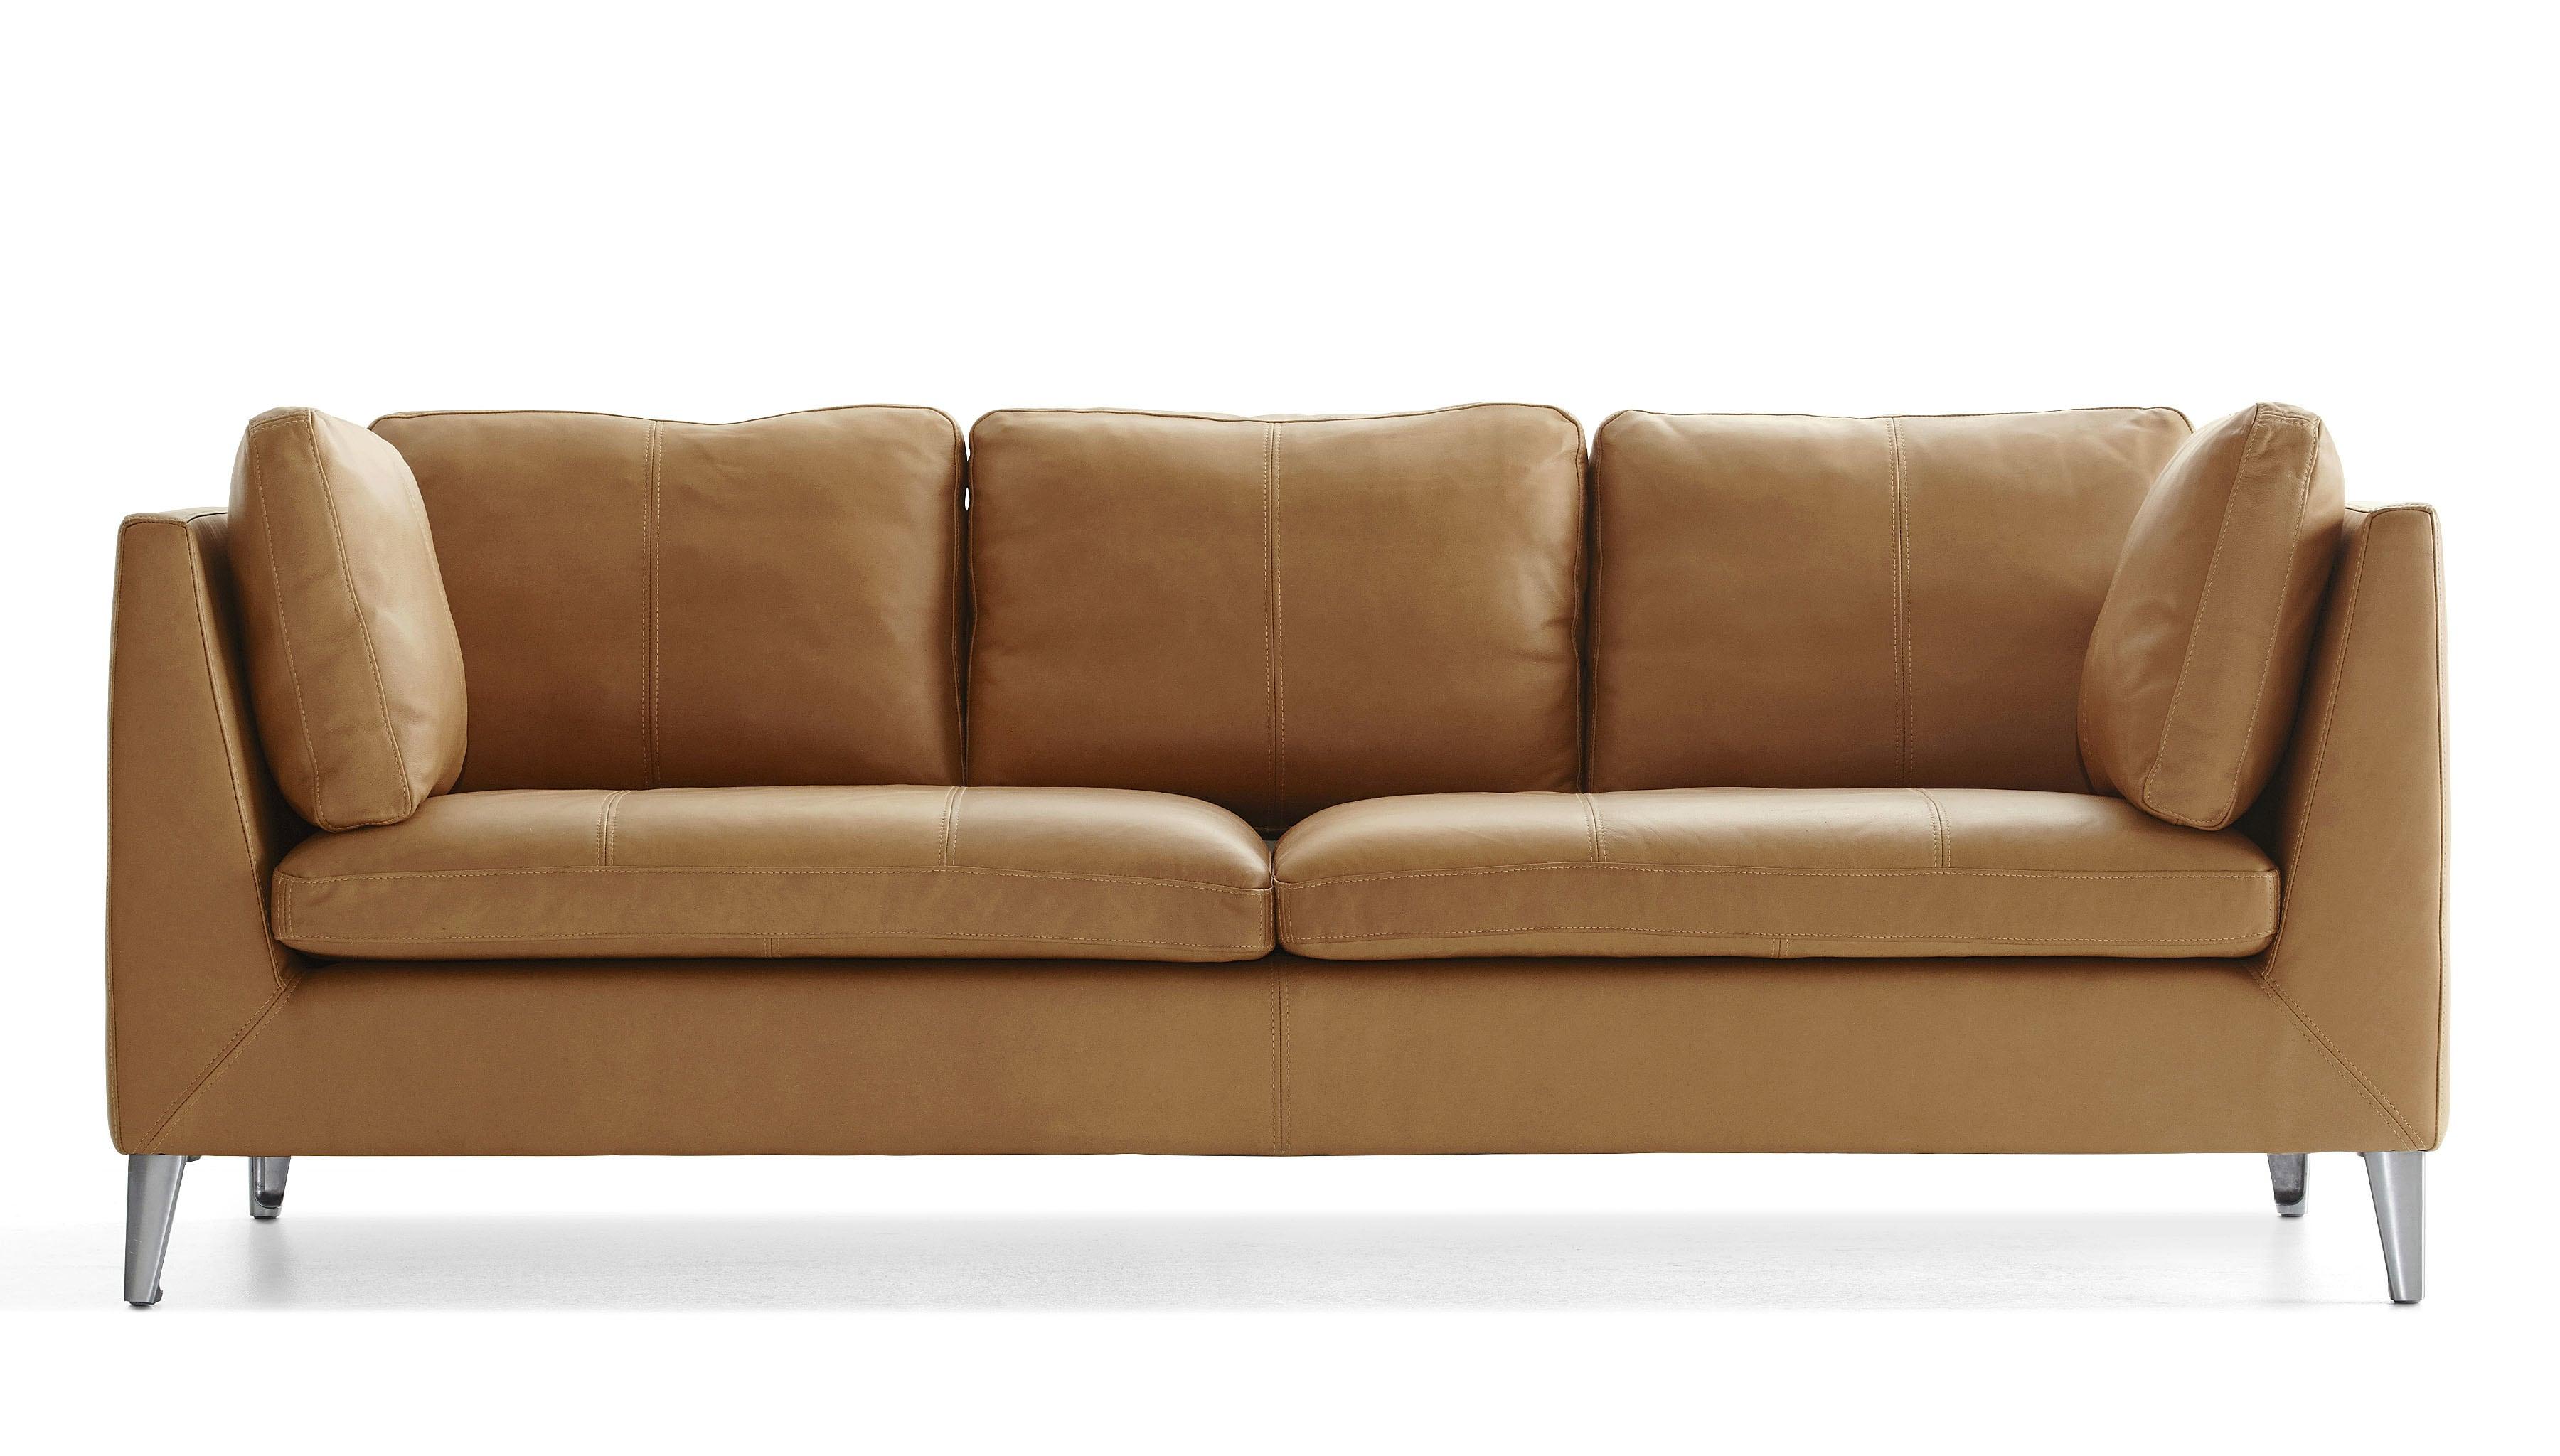 Tiendas sofas Sevilla Xtd6 sofà S Y Sillones Pra Online Ikea